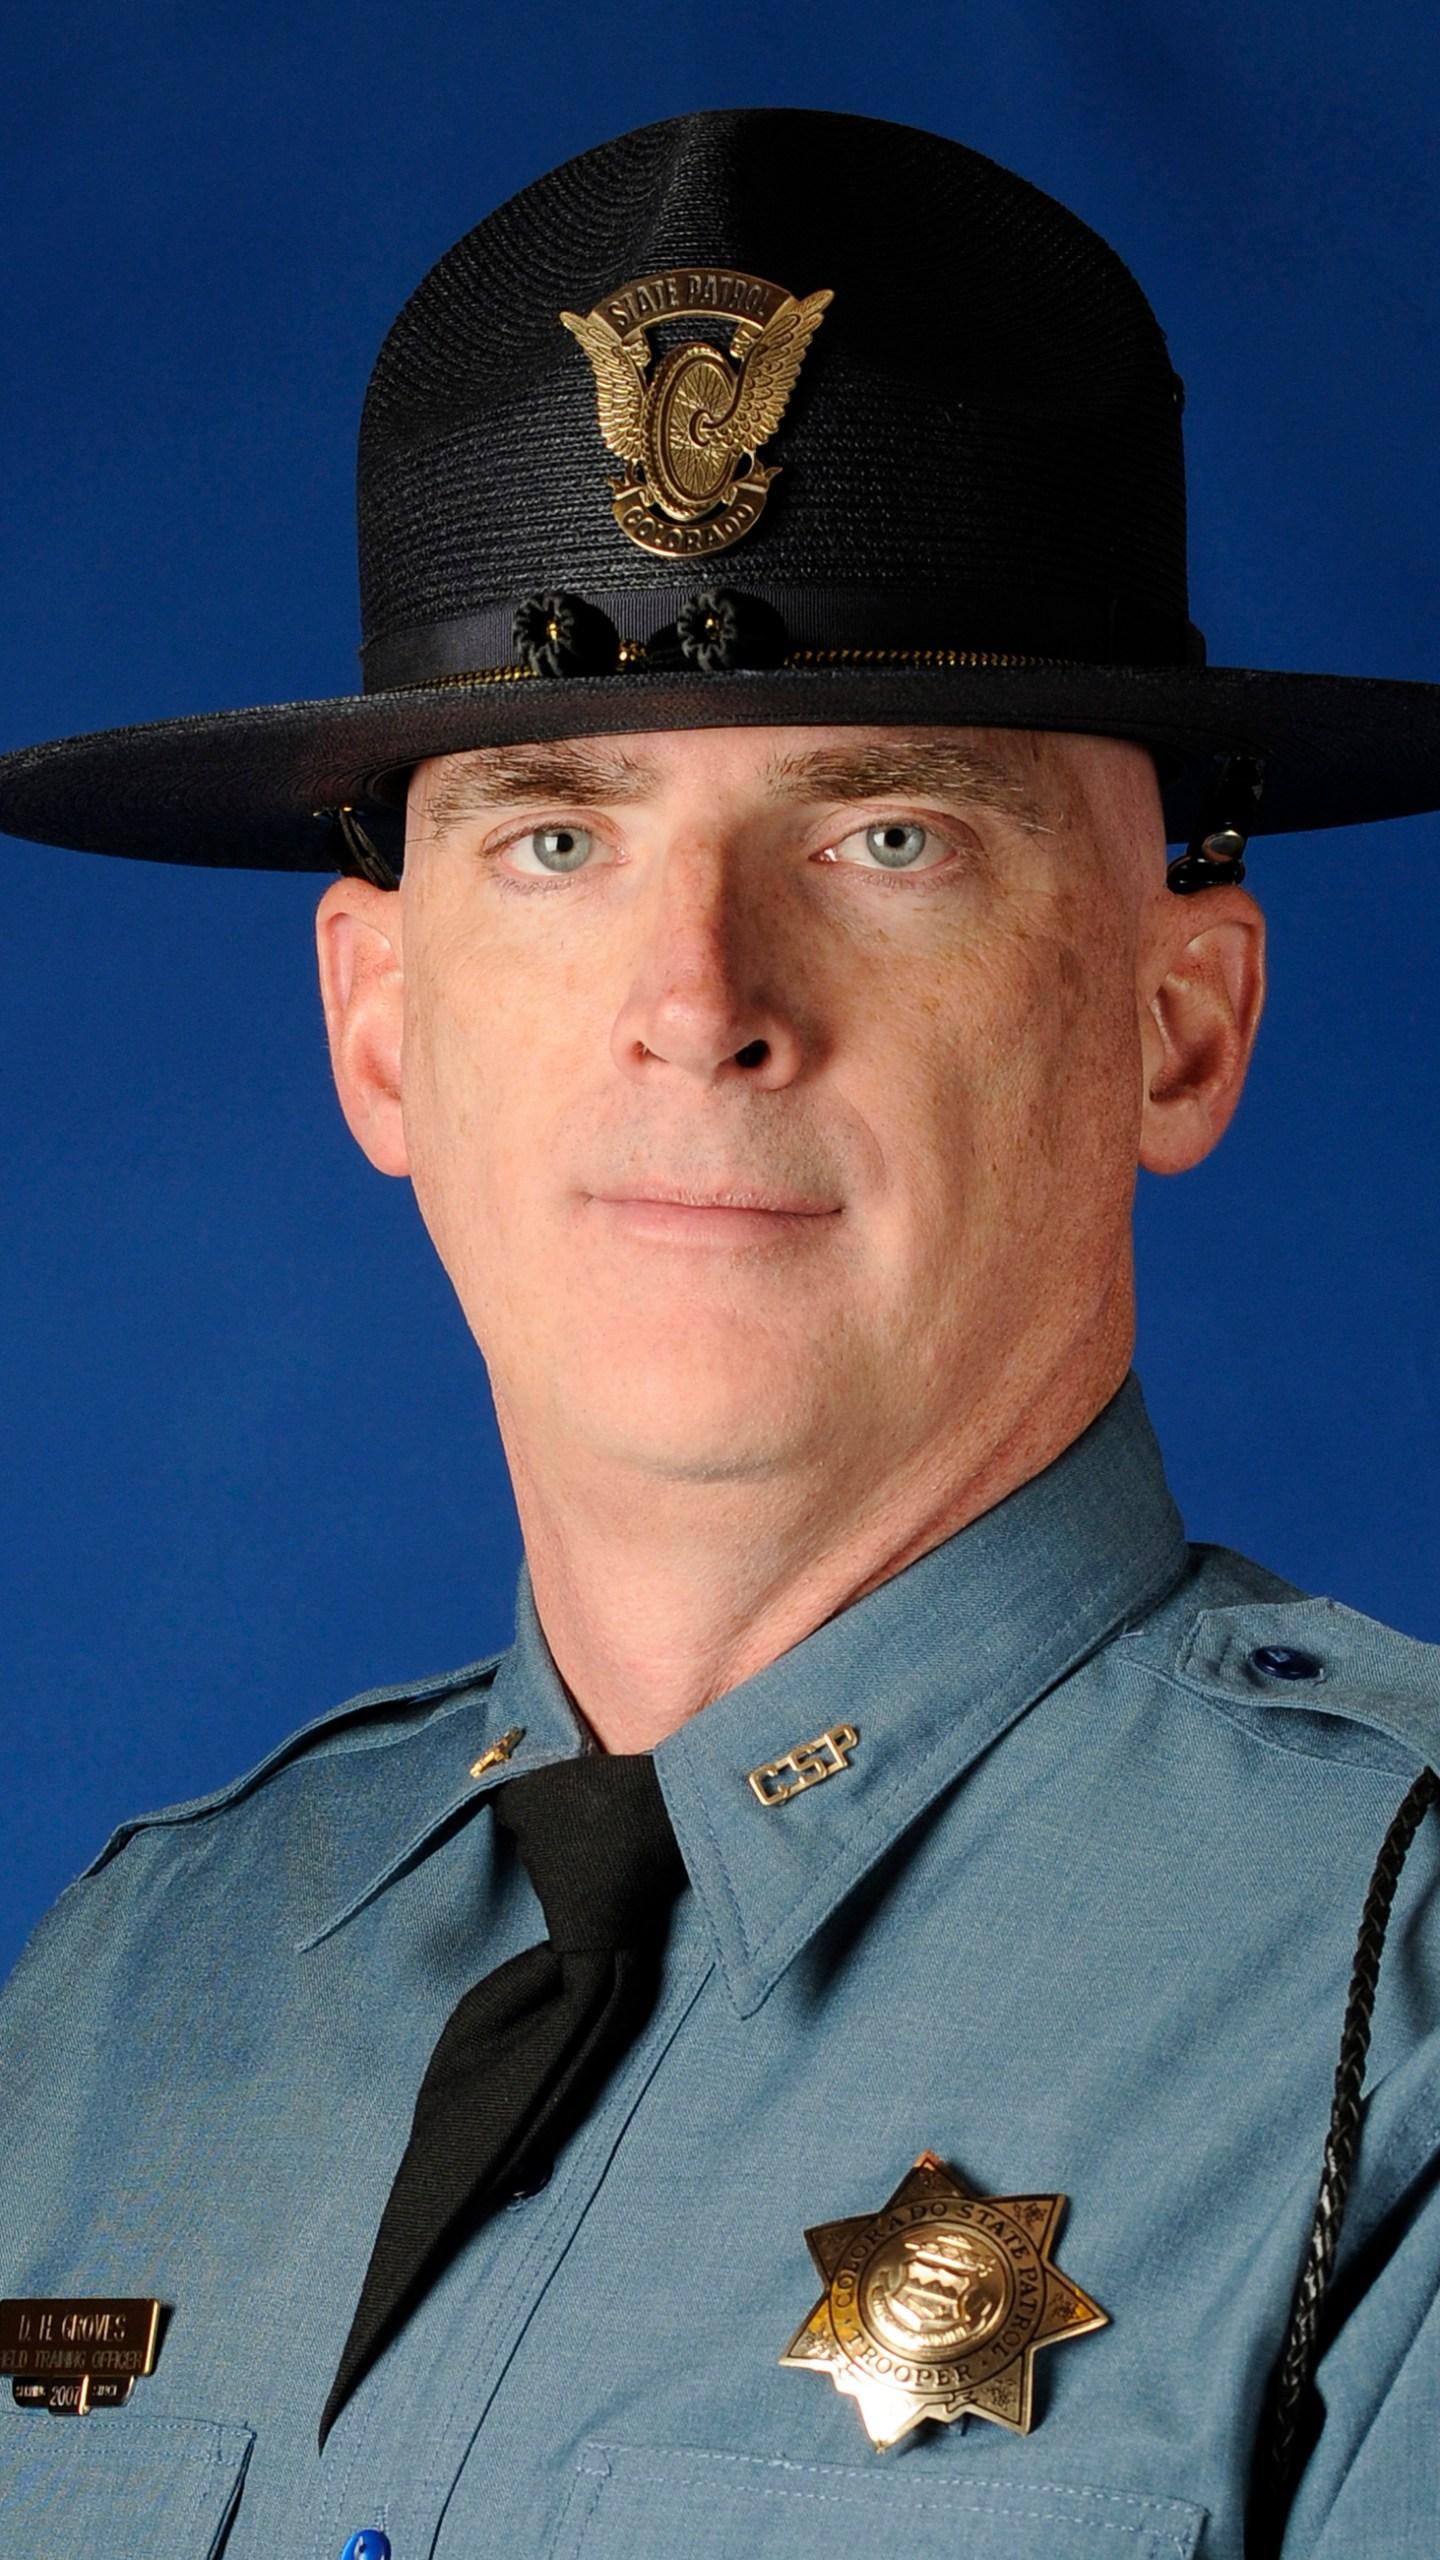 Cpl. Daniel Groves Colorado State Patrol 2